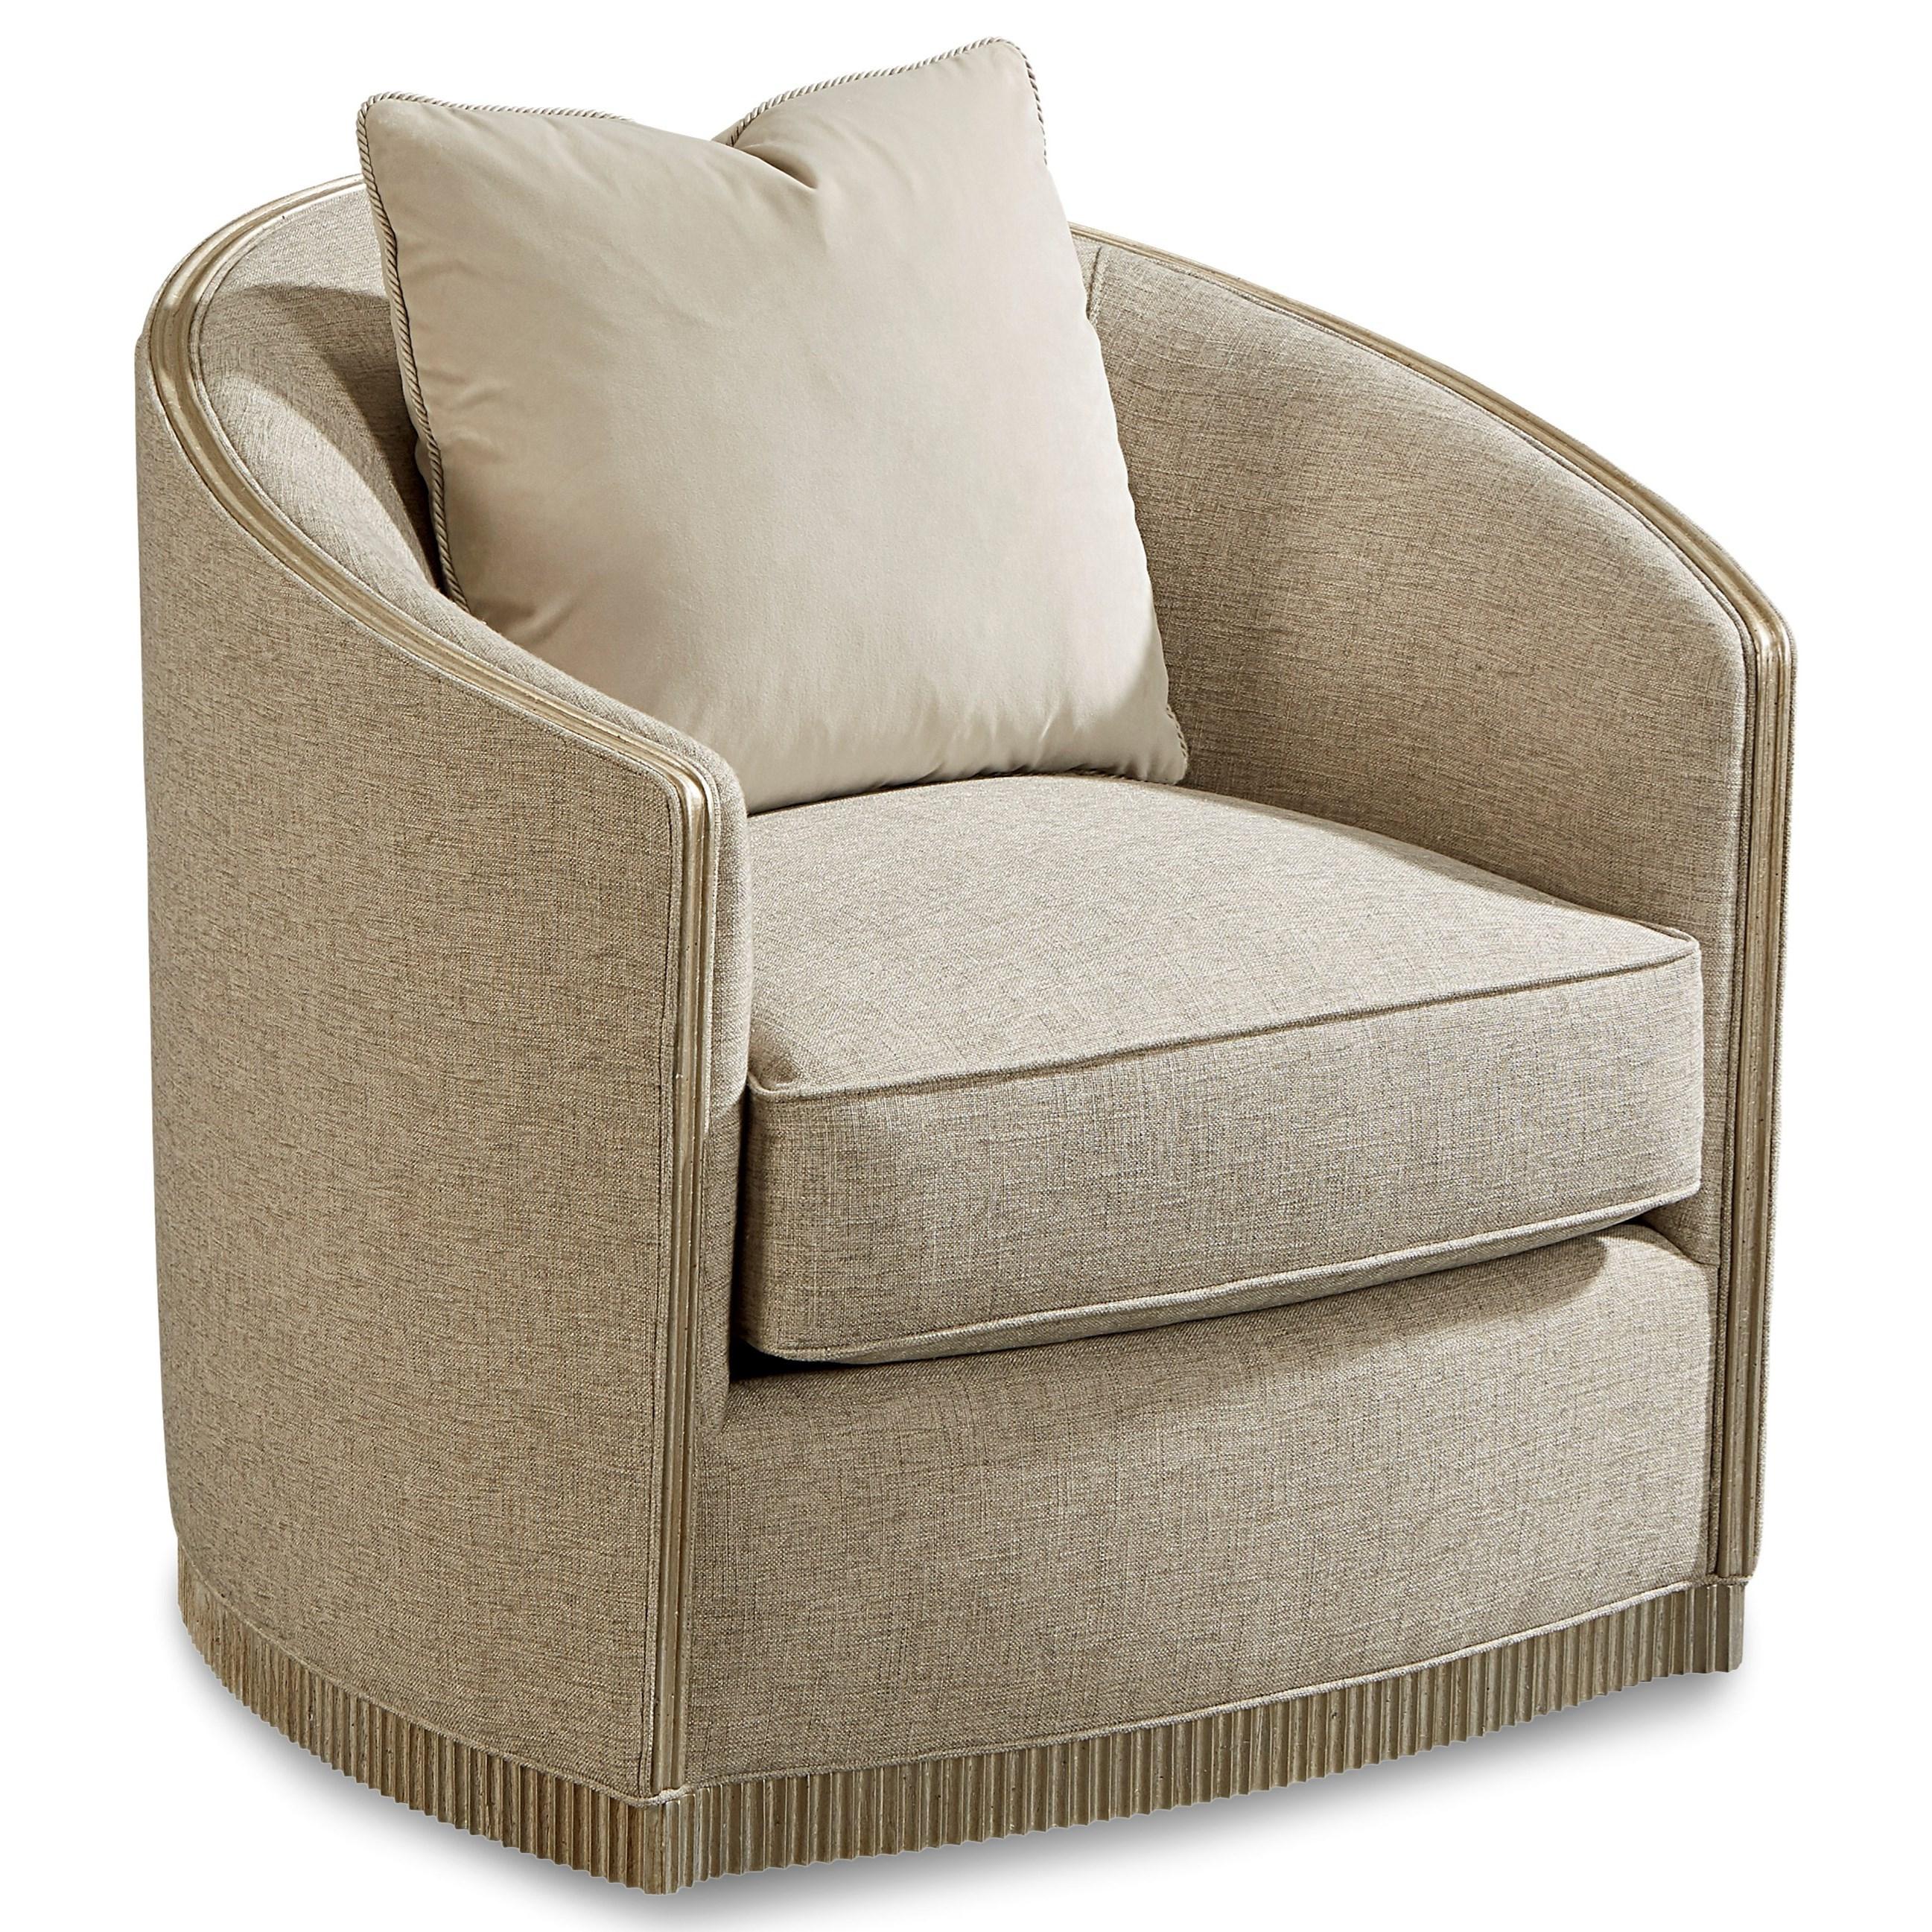 Morrissey Upholstery Luhrman Swivel Chair